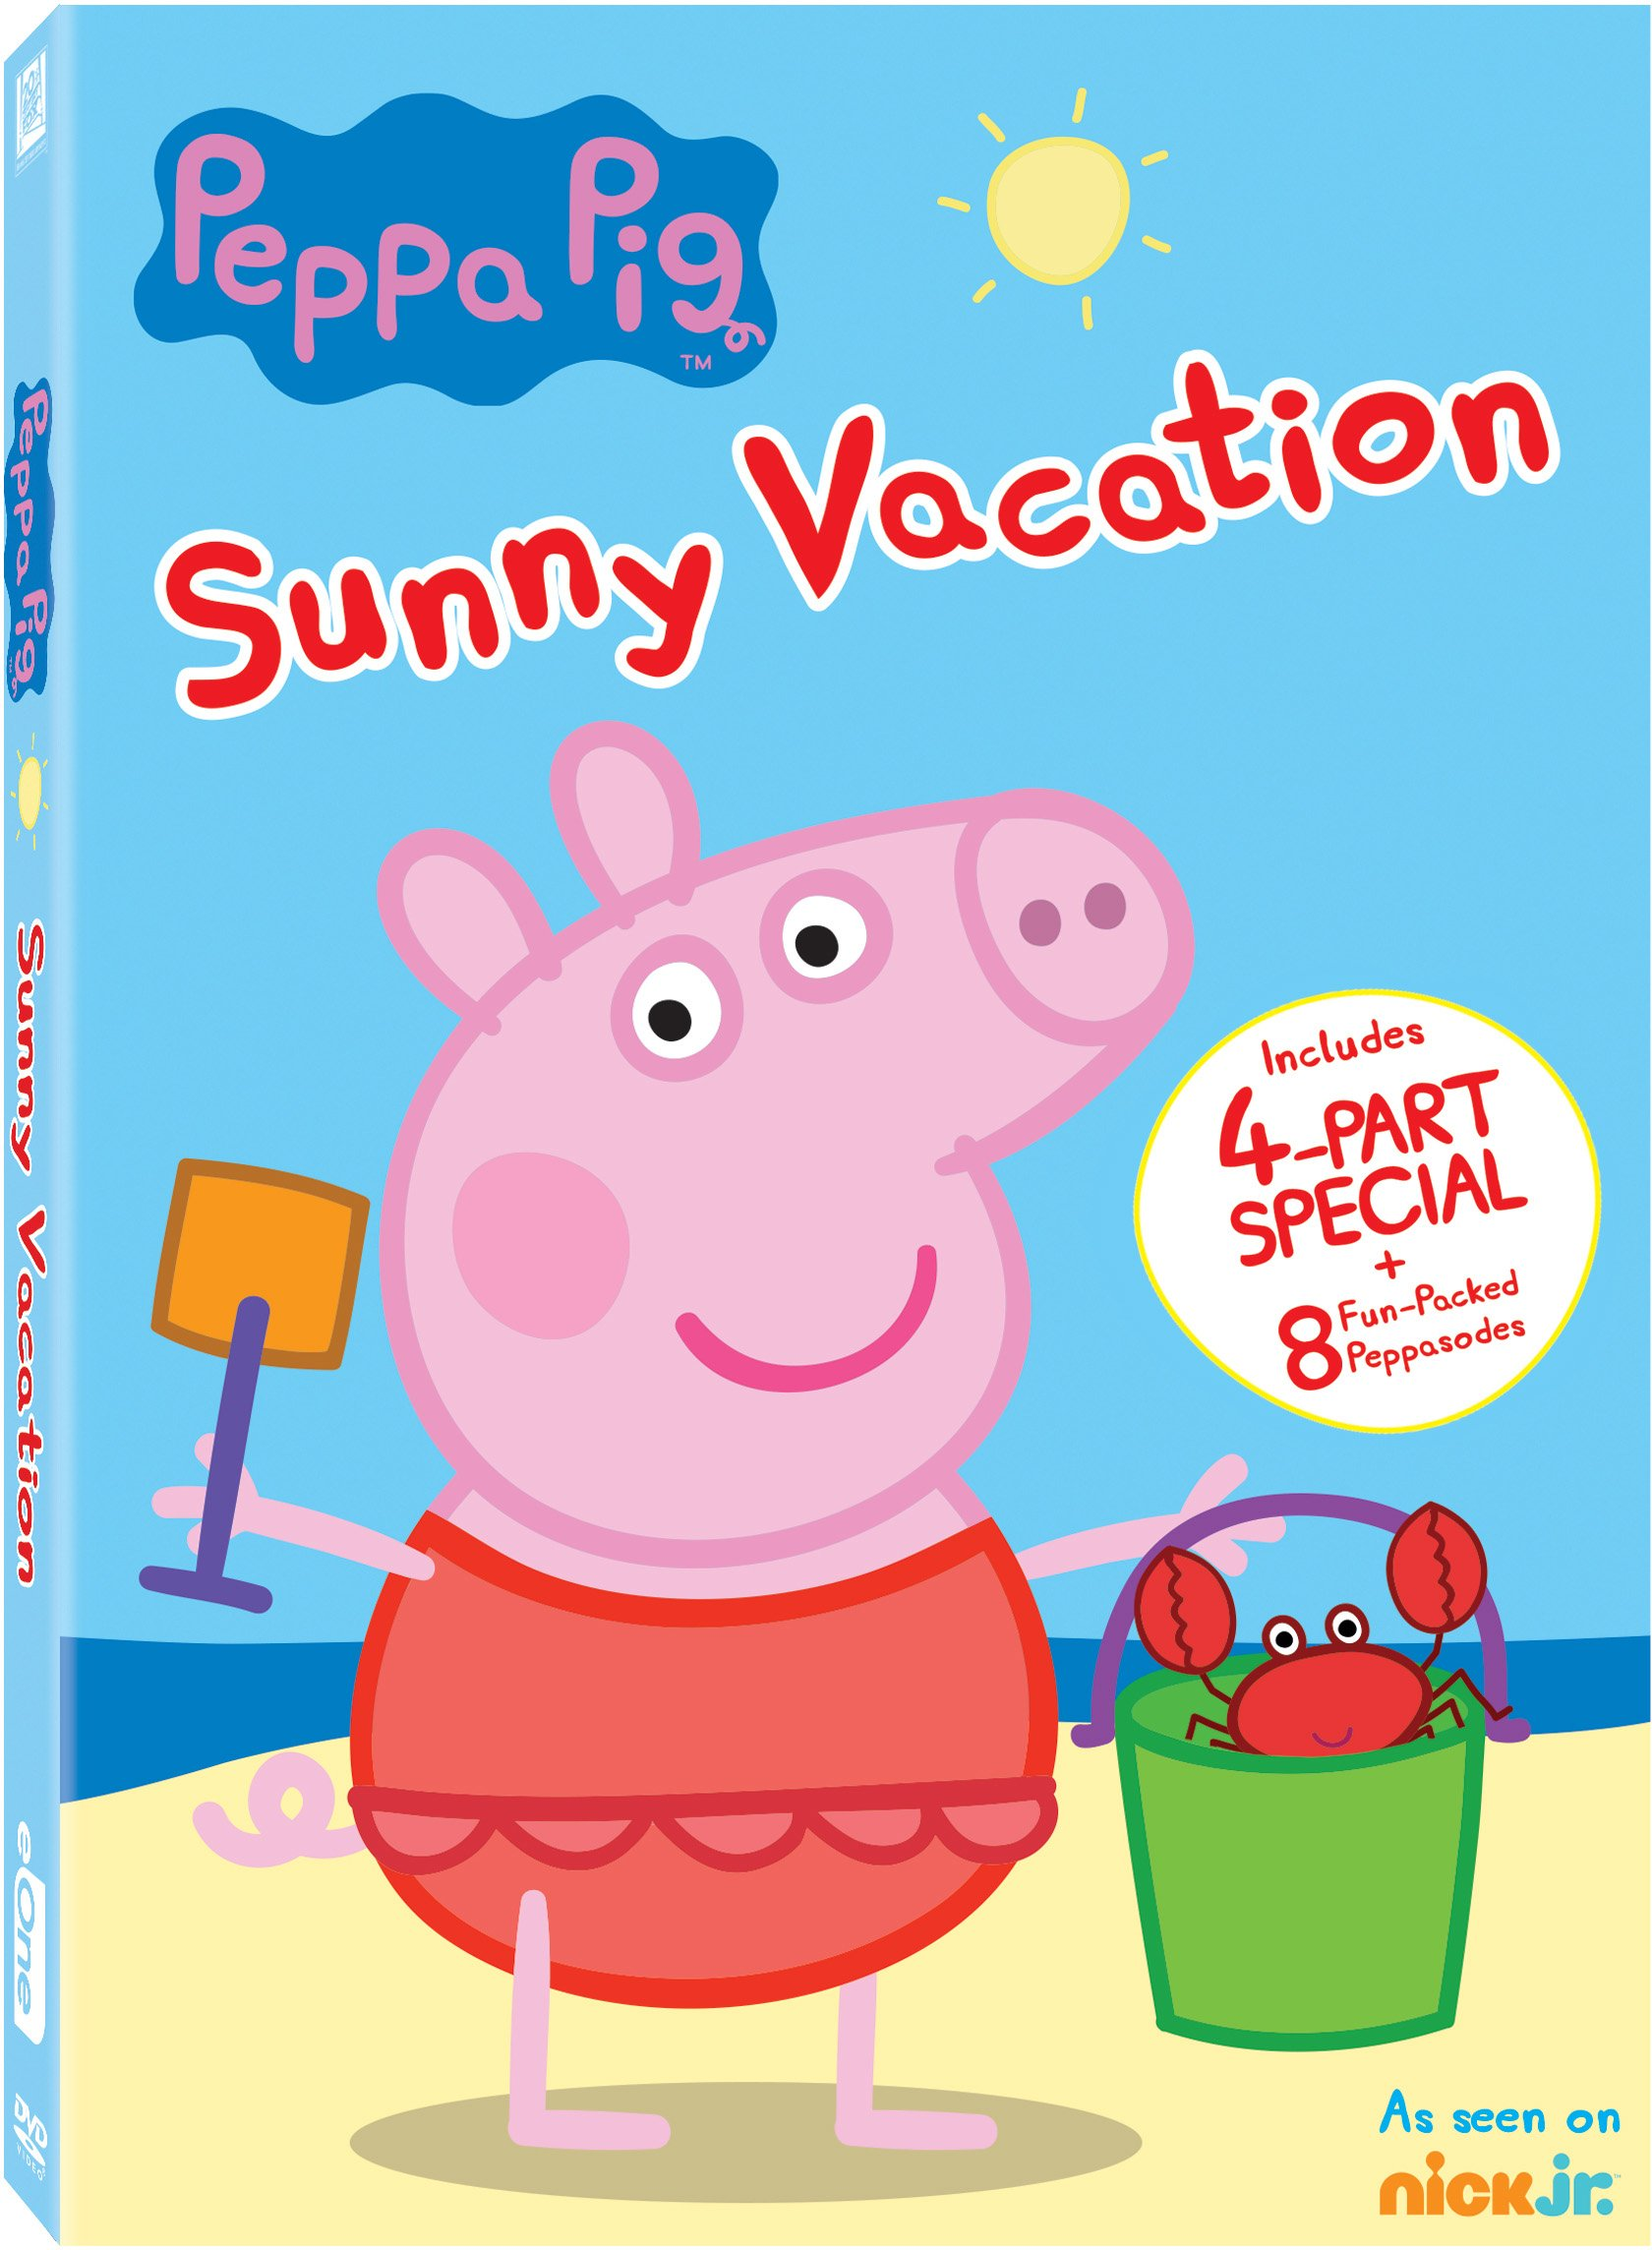 Peppa Pig: Sunny Vacation 2